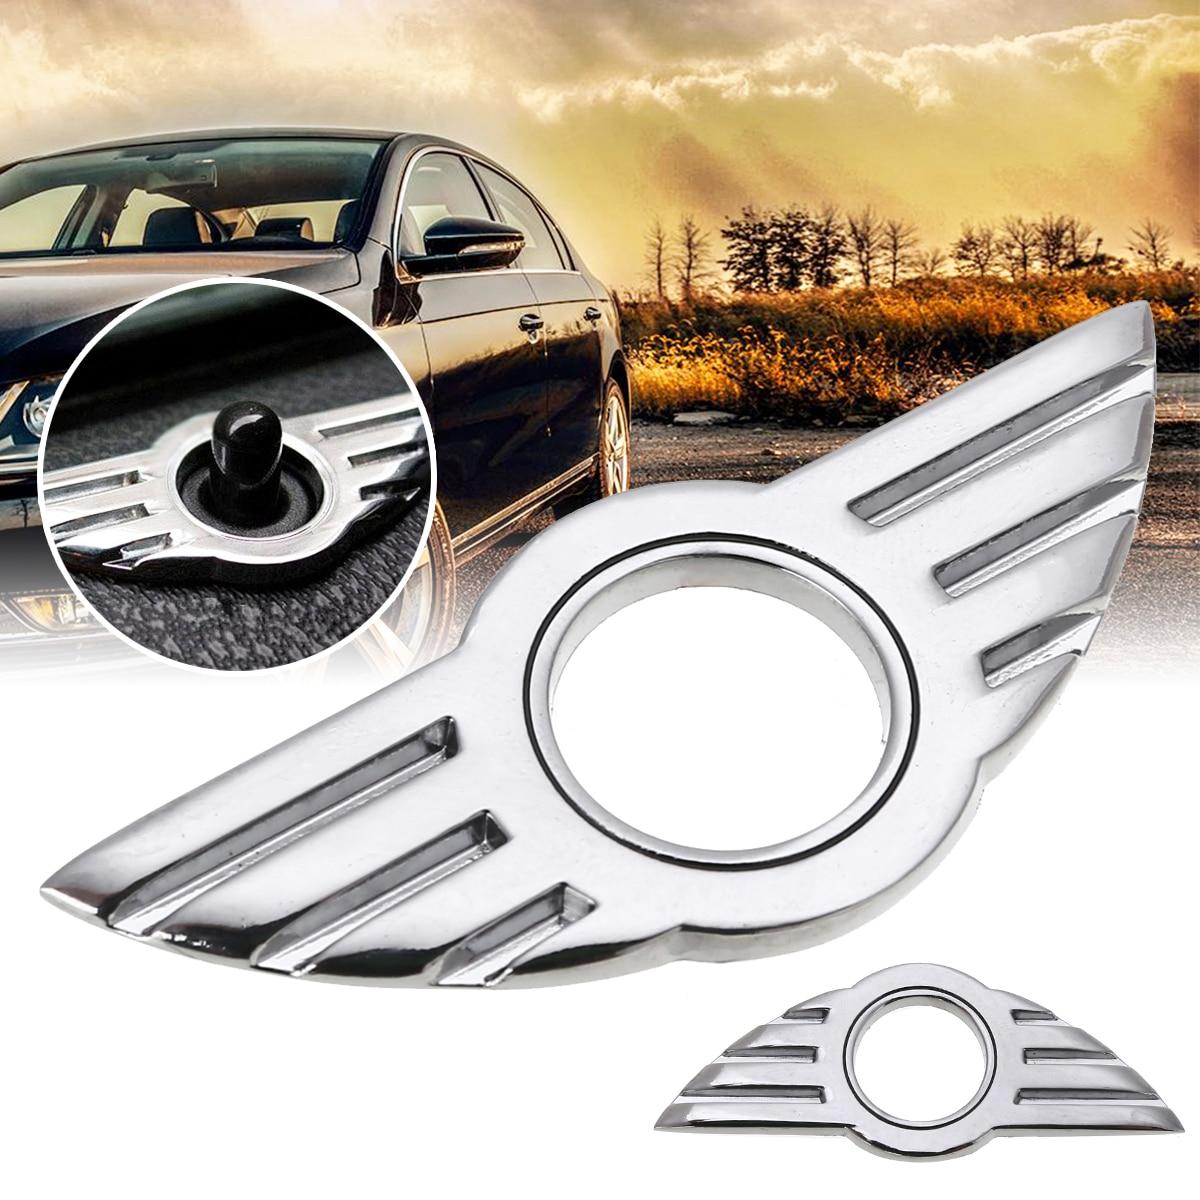 Exterior Accessories Responsible 2pcs For Car Seat Belt Clip Extender For Buick Lacrosse Verano Gs Regal Excelle Encore Auto Accessories